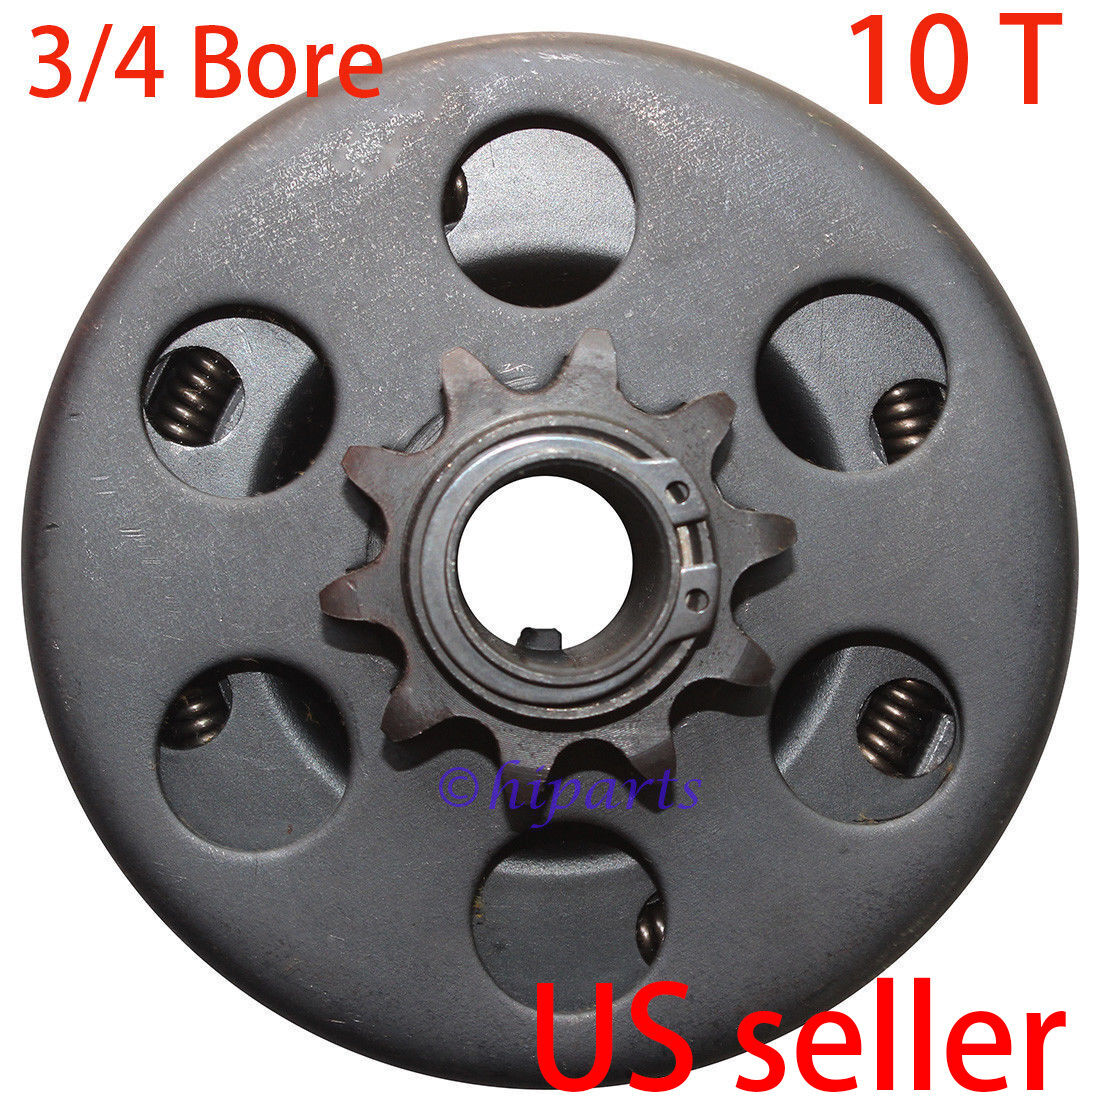 Woniu Centrifugal Go Kart Mini Bike Clutch 3//4 Bore 10 Tooth 10T for 40,41,420 Size Chain